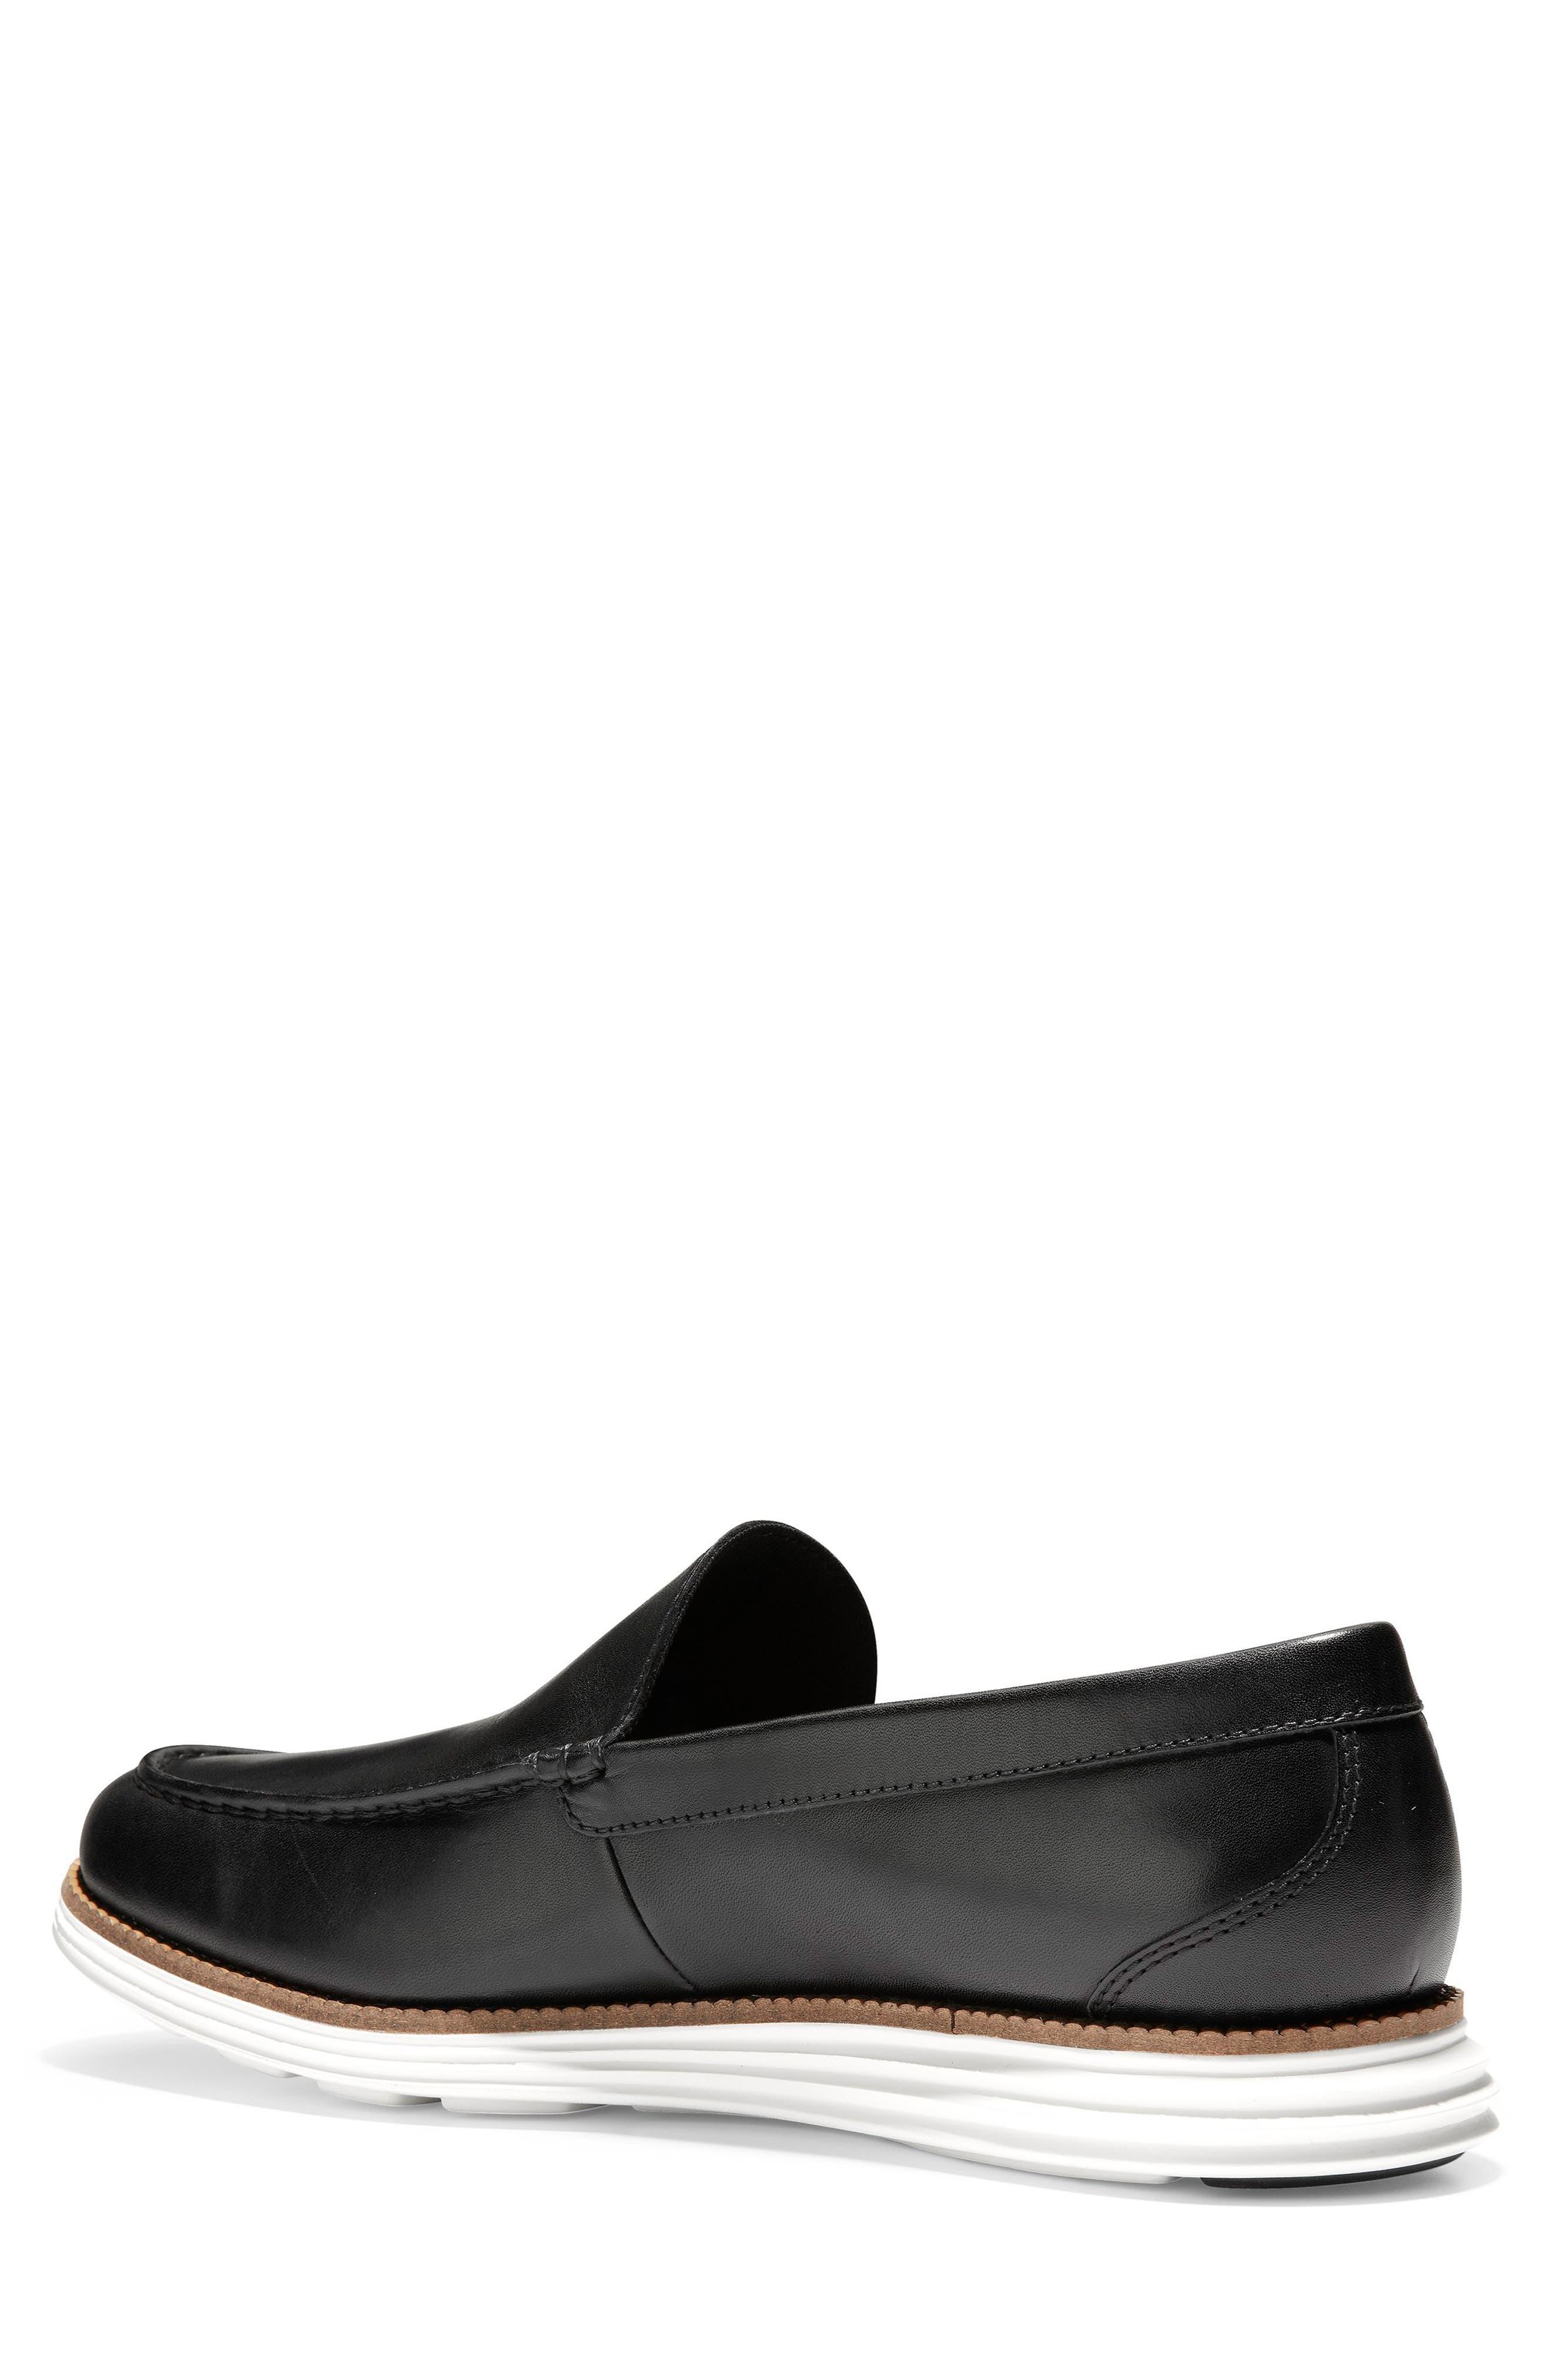 Original Grand Loafer,                             Alternate thumbnail 2, color,                             BLACK/ OPTIC WHITE LEATHER